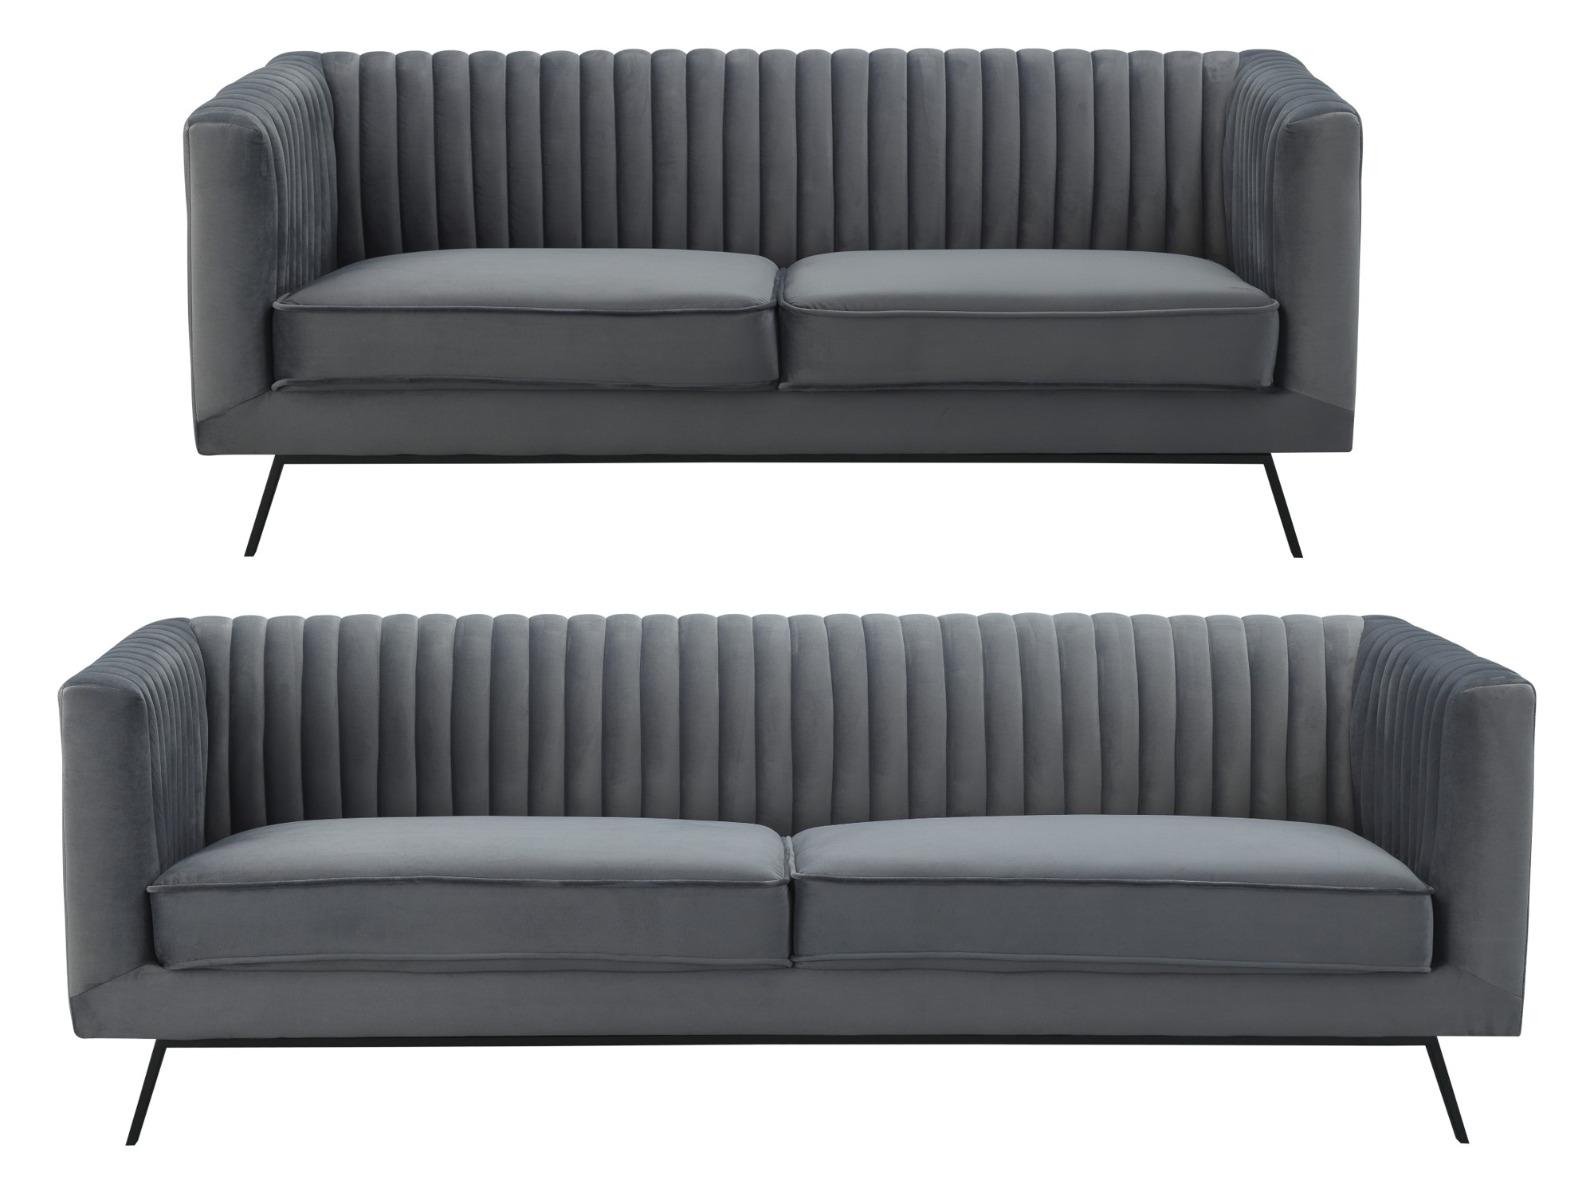 Vandam Sofa and Loveseat Set